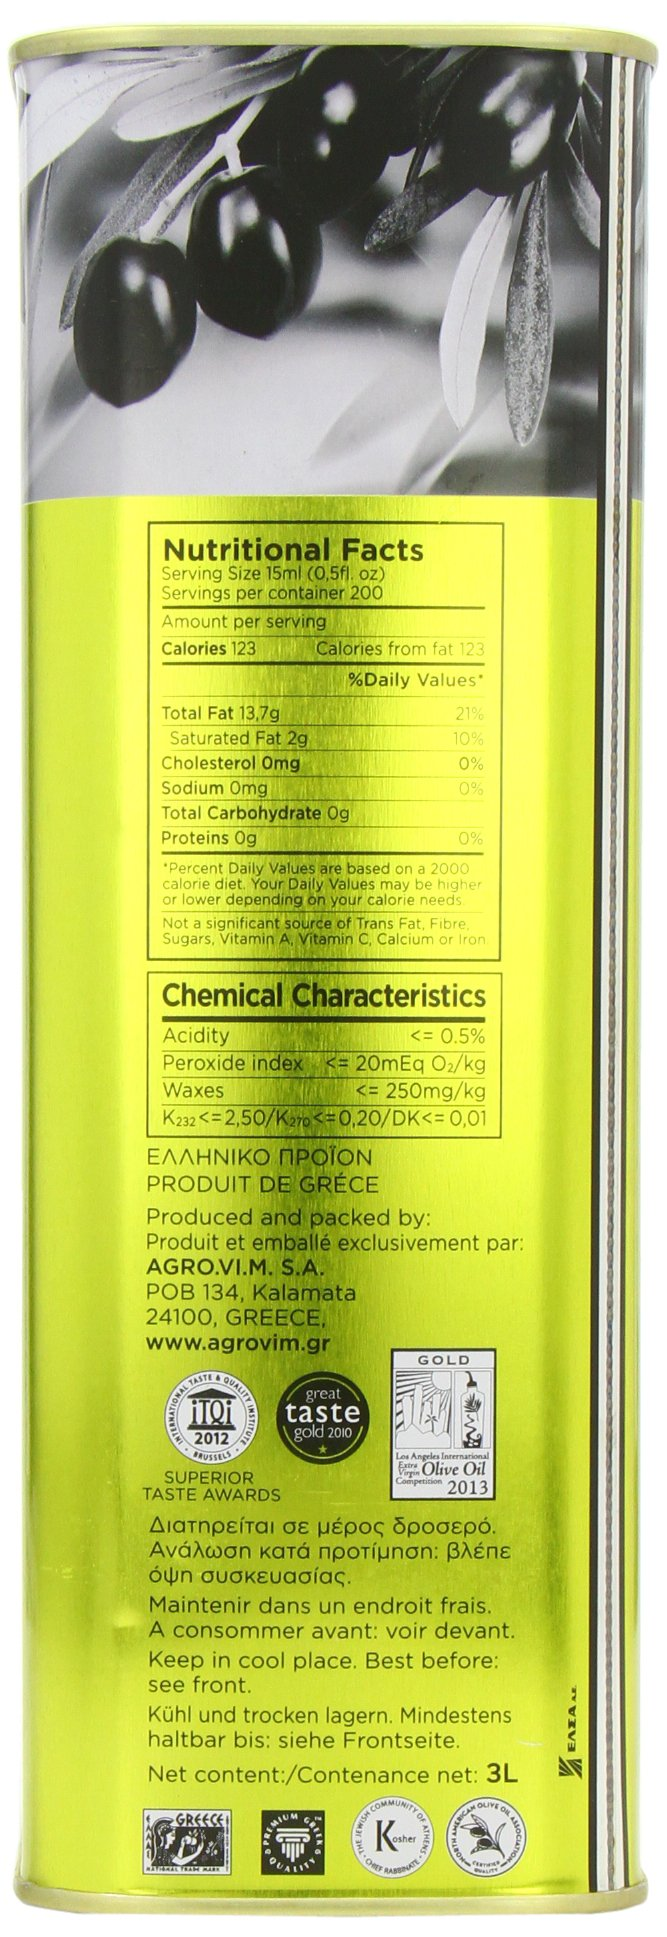 Iliada Extra Virgin Olive Oil Tin, 3 Liter by Iliada (Image #3)